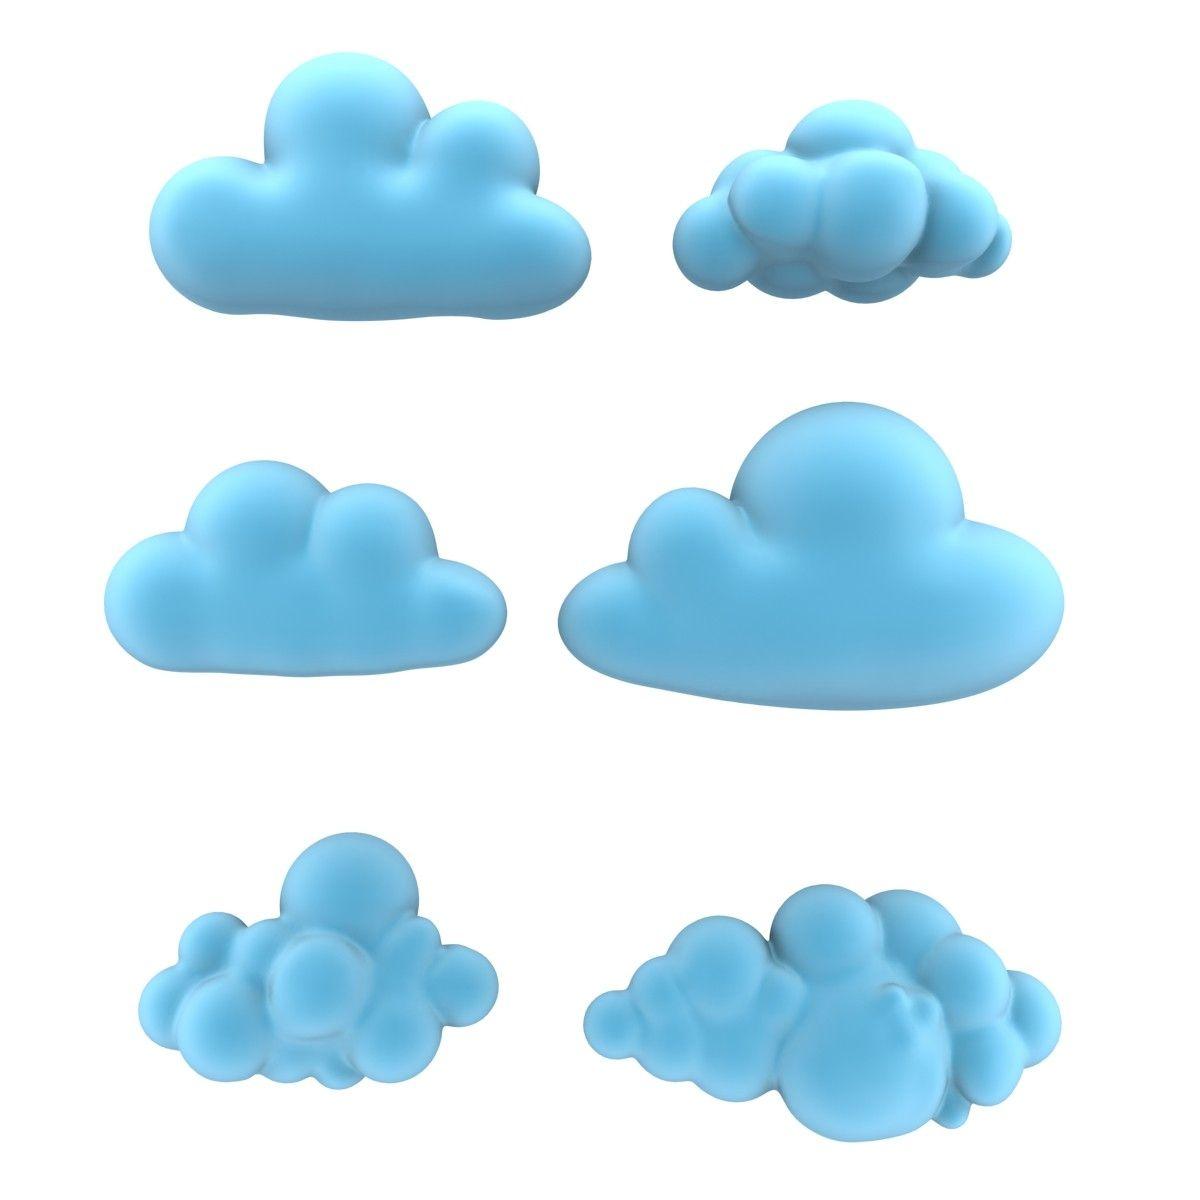 x cartoon clouds.